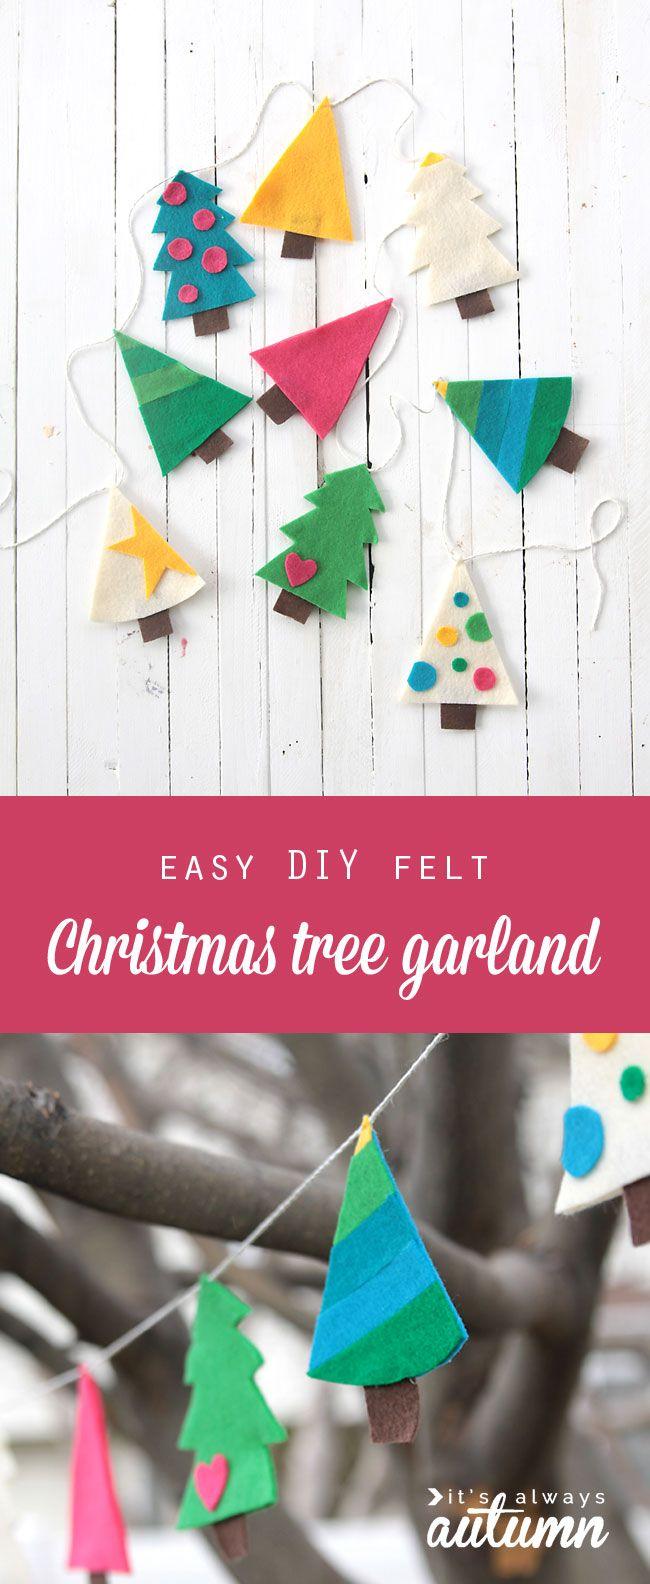 easy DIY felt Christmas tree garland - simple holiday decor   Christmas trees, Its always and ...